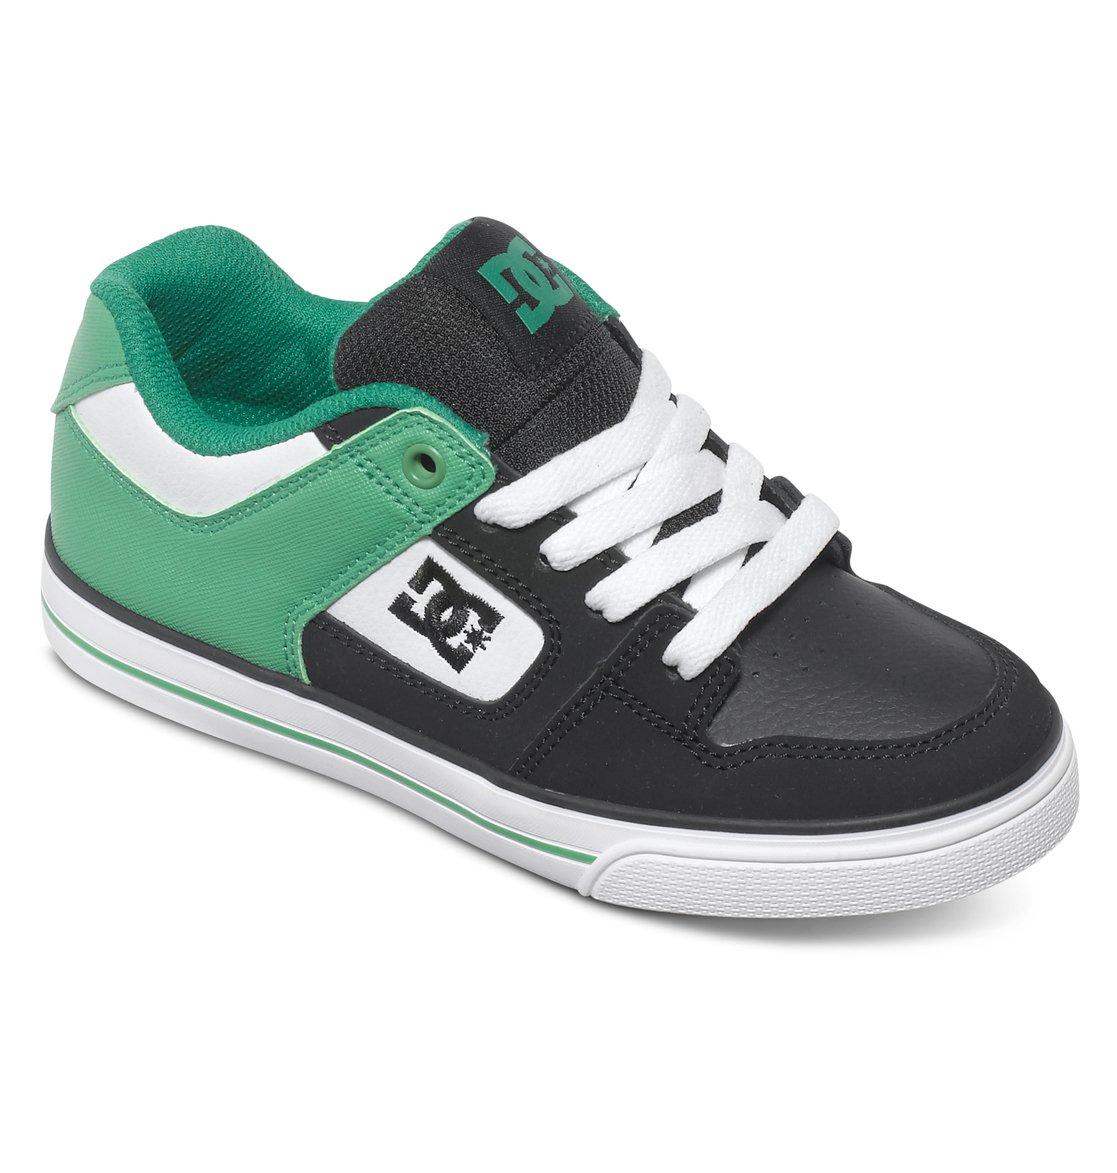 boy 39 s 8 16 pure shoes 888327089539 dc shoes. Black Bedroom Furniture Sets. Home Design Ideas